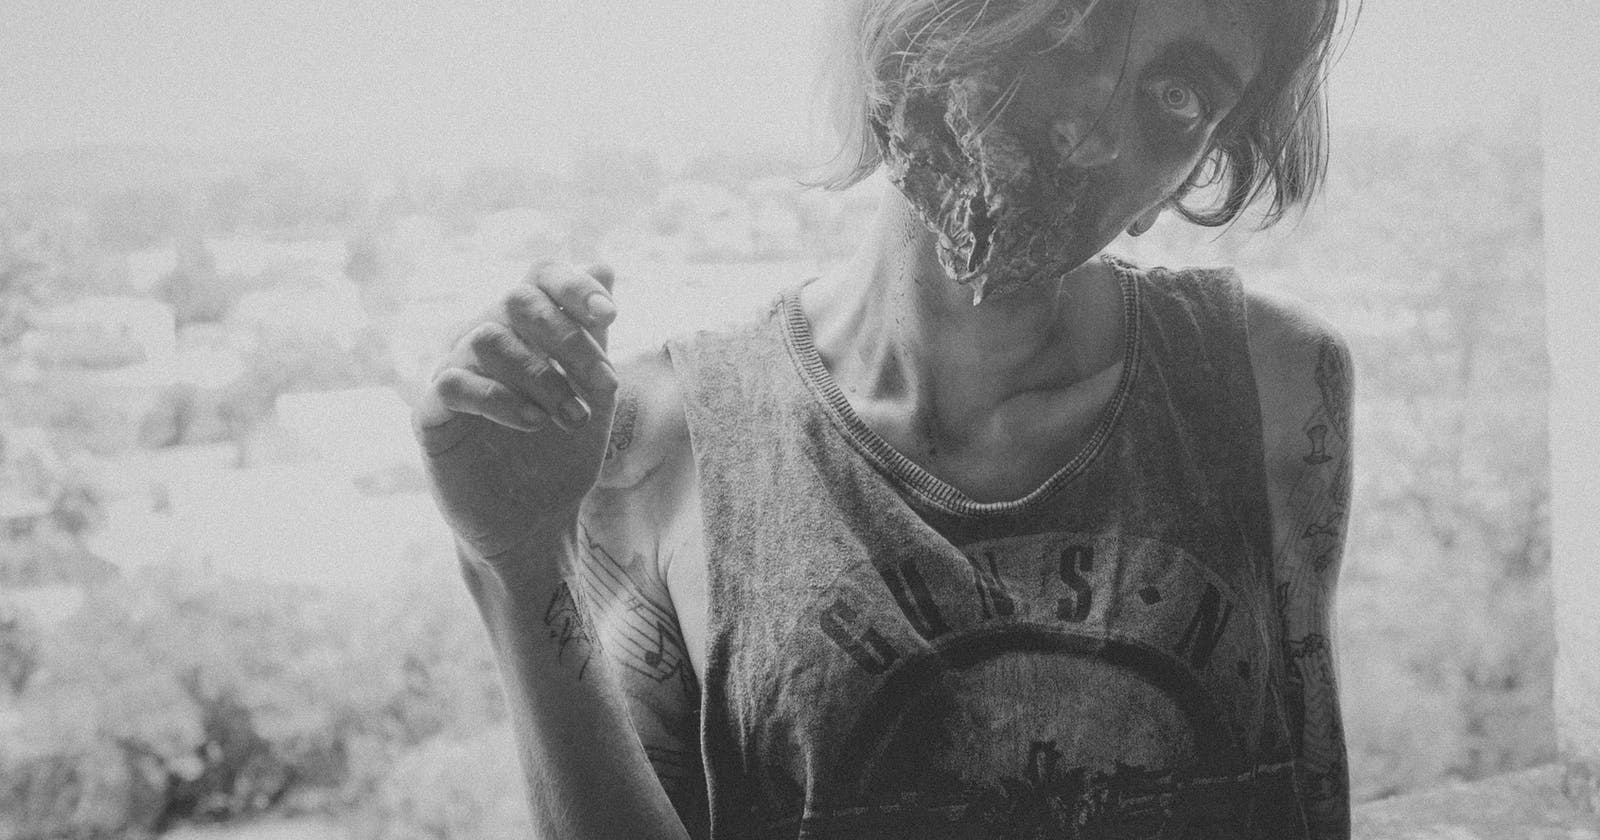 How I Survived the Zombie Apocalypse